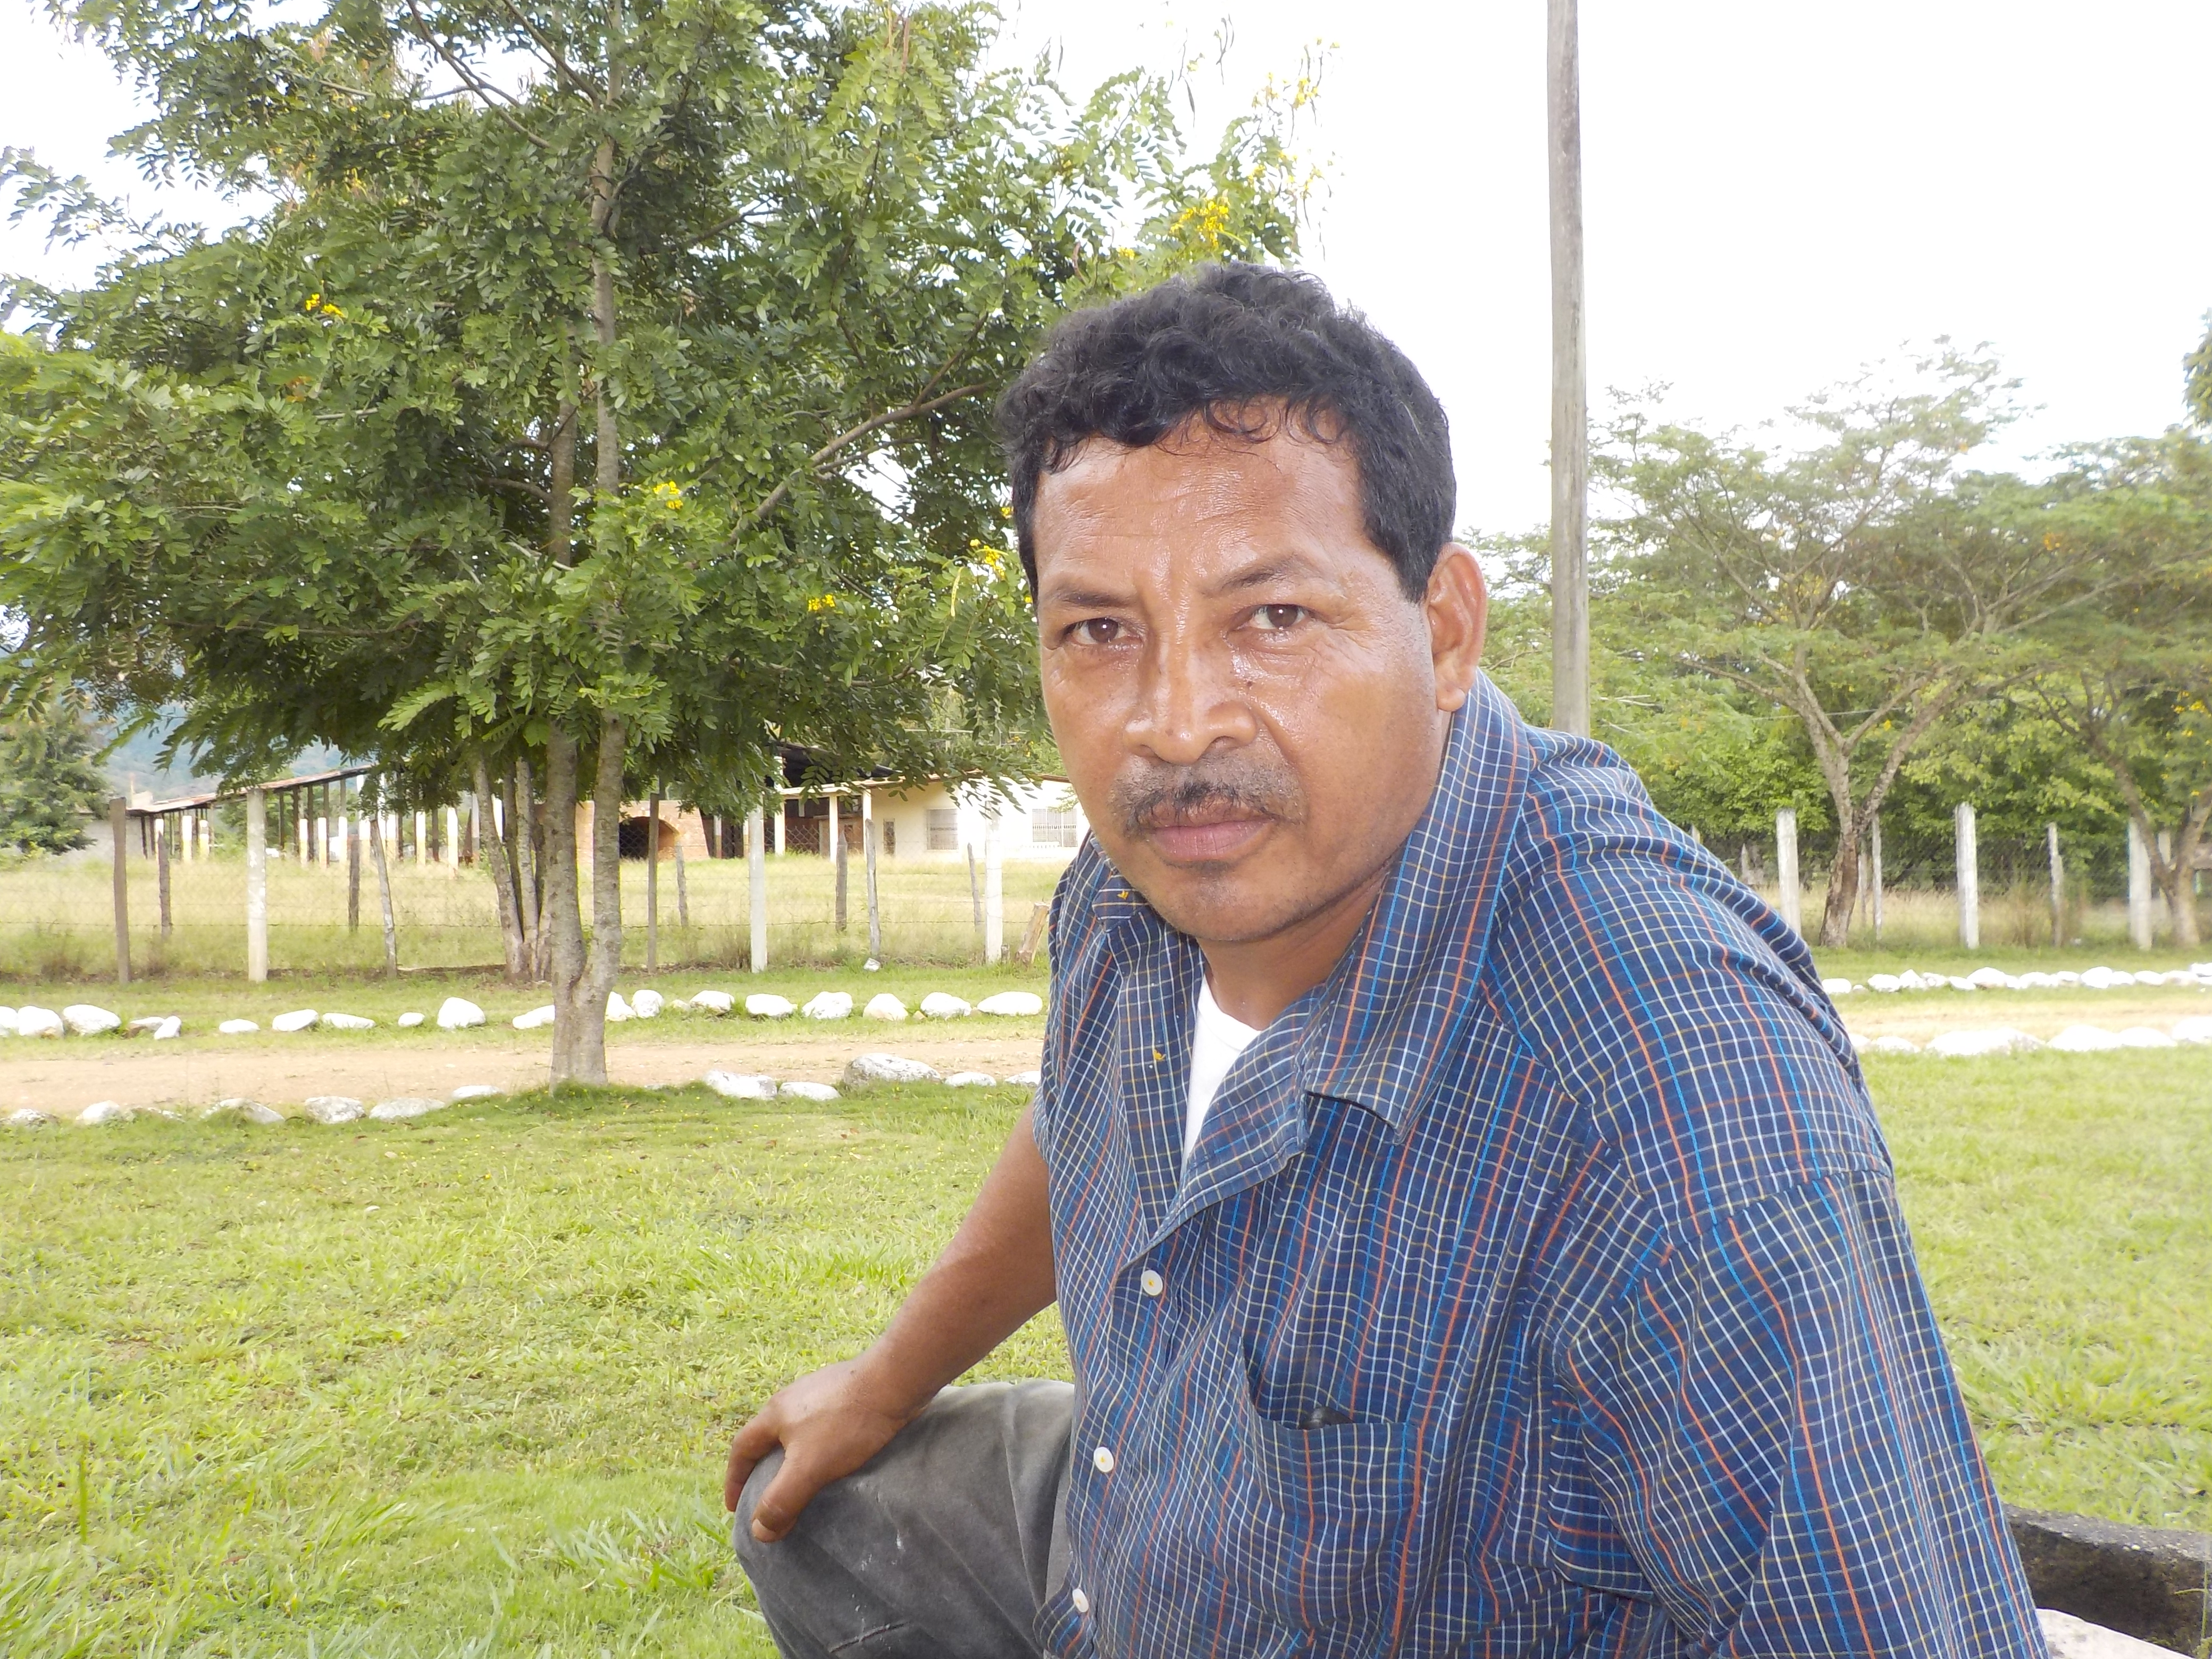 Honduras_2017_Maryjane_Westra_5.jpeg